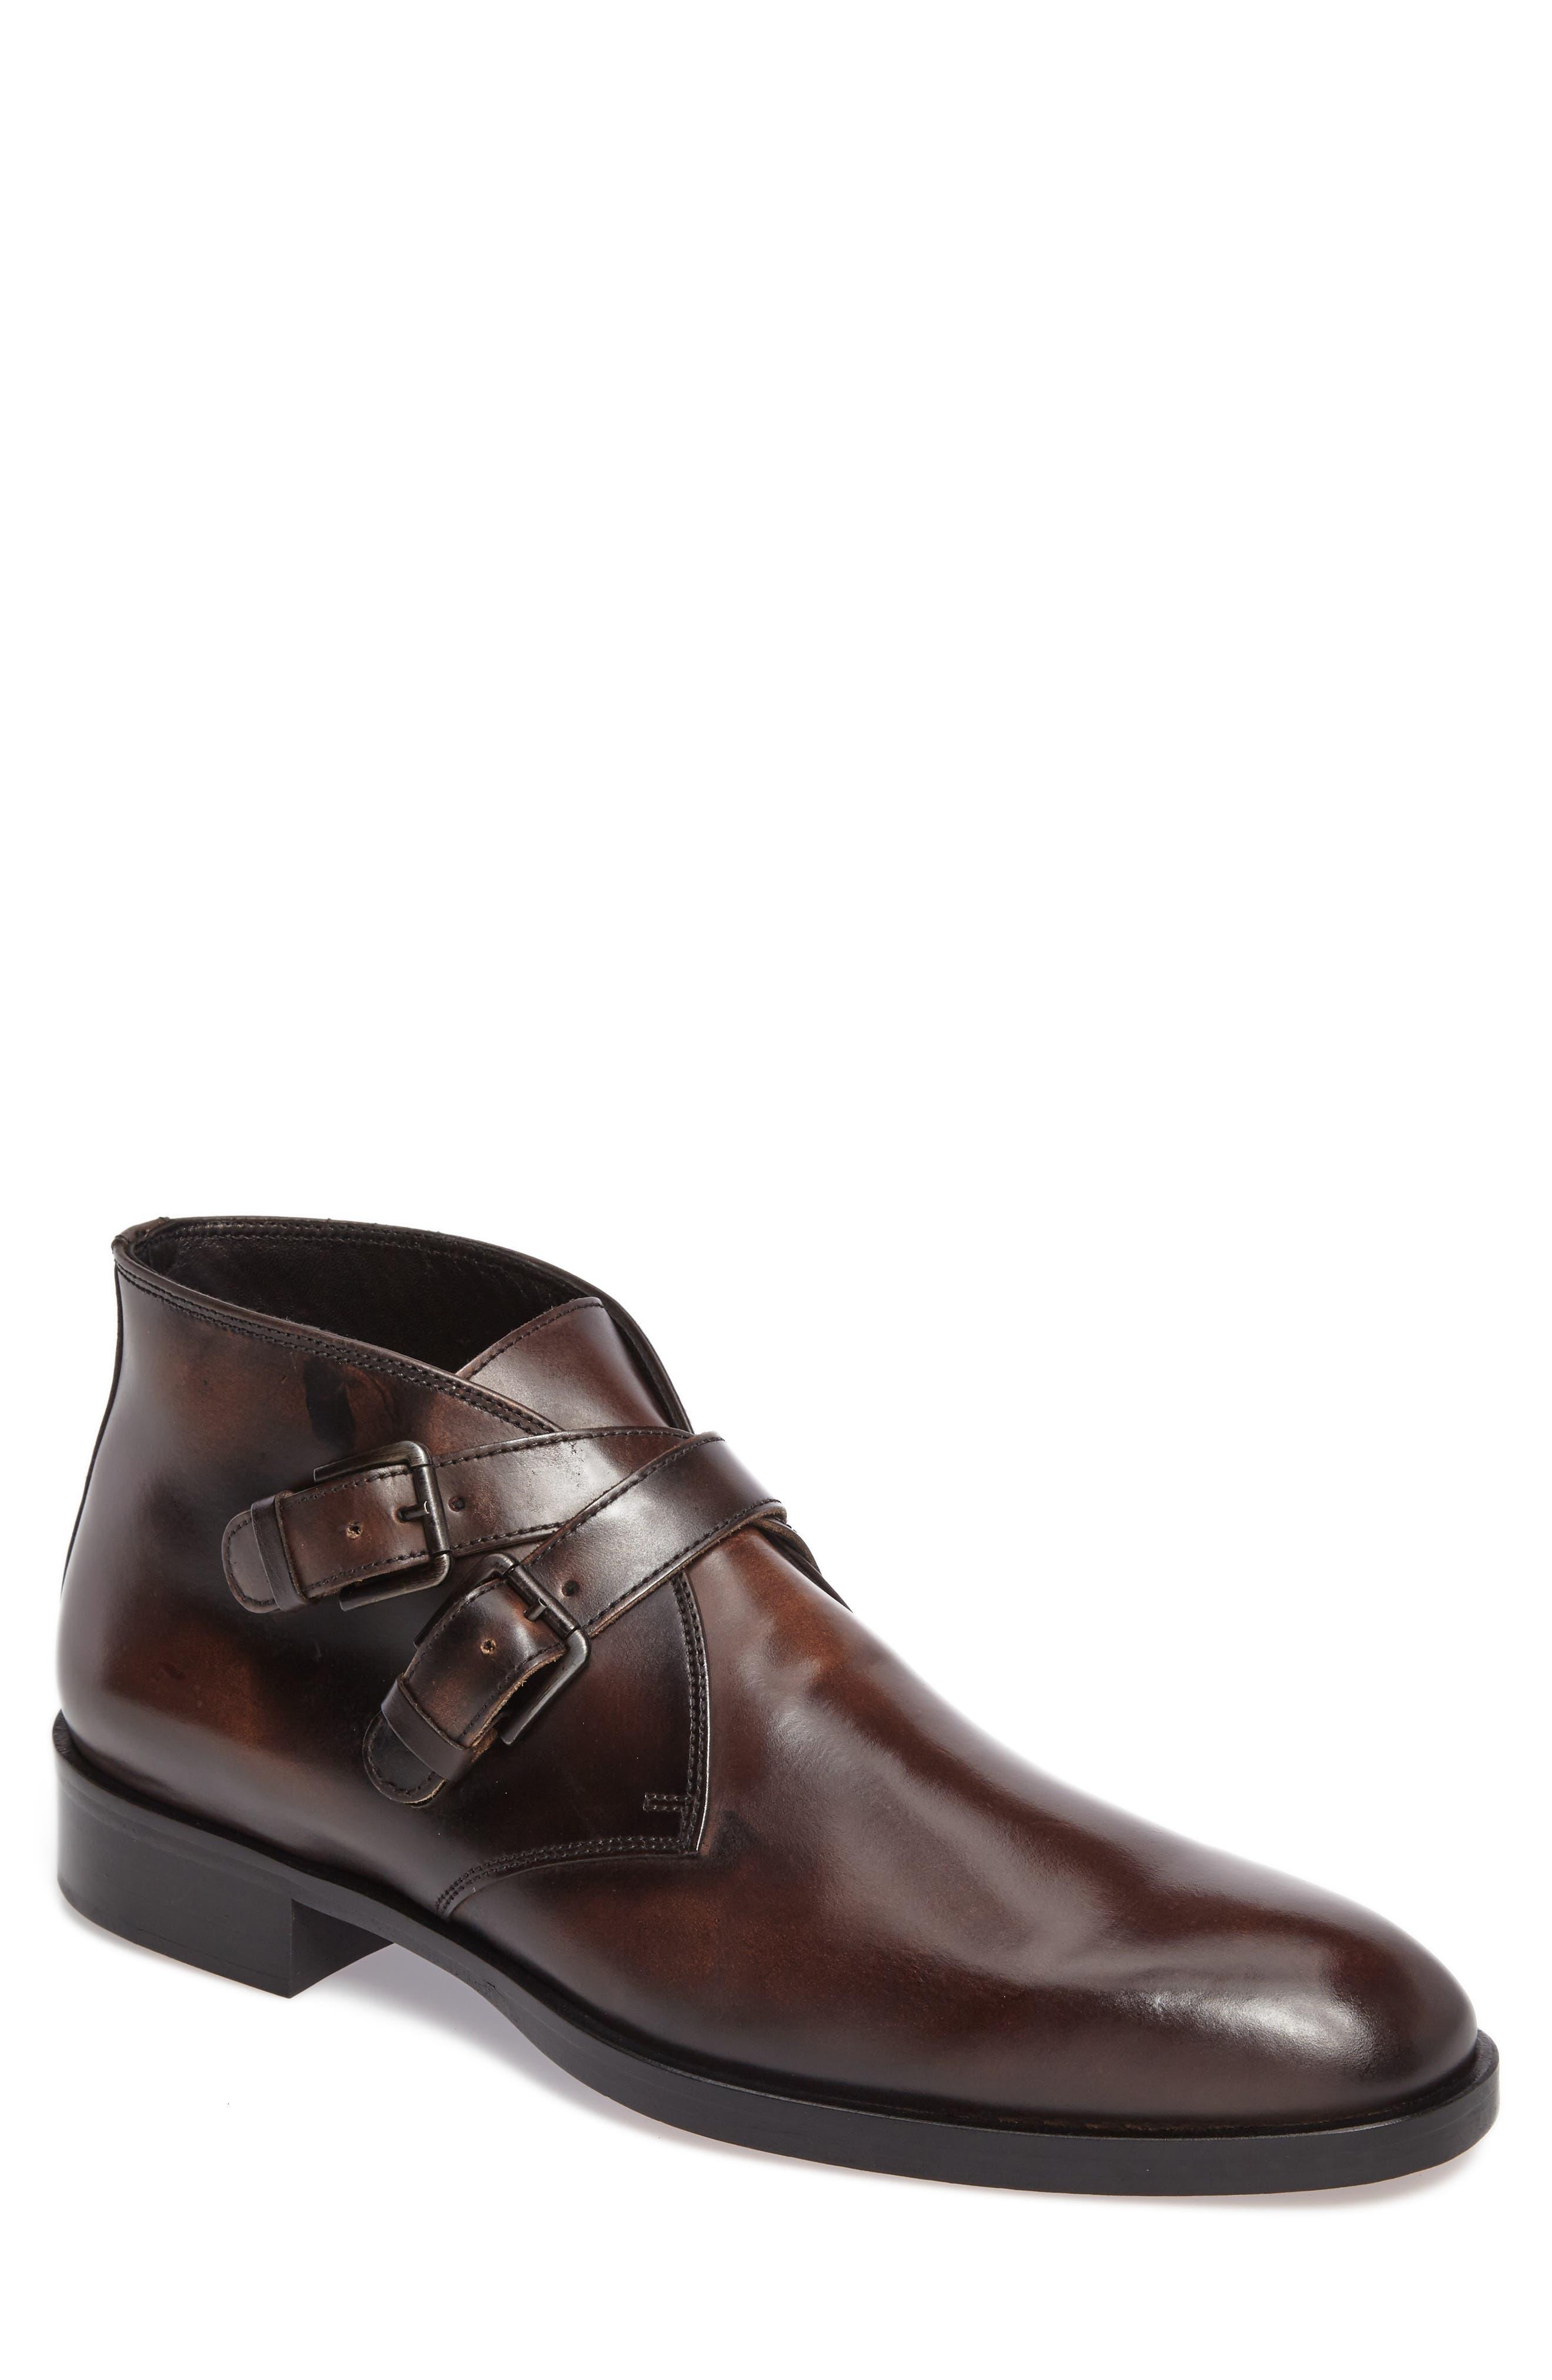 Donald J Pliner Zigor Double Monk Strap Boot,                             Main thumbnail 1, color,                             200